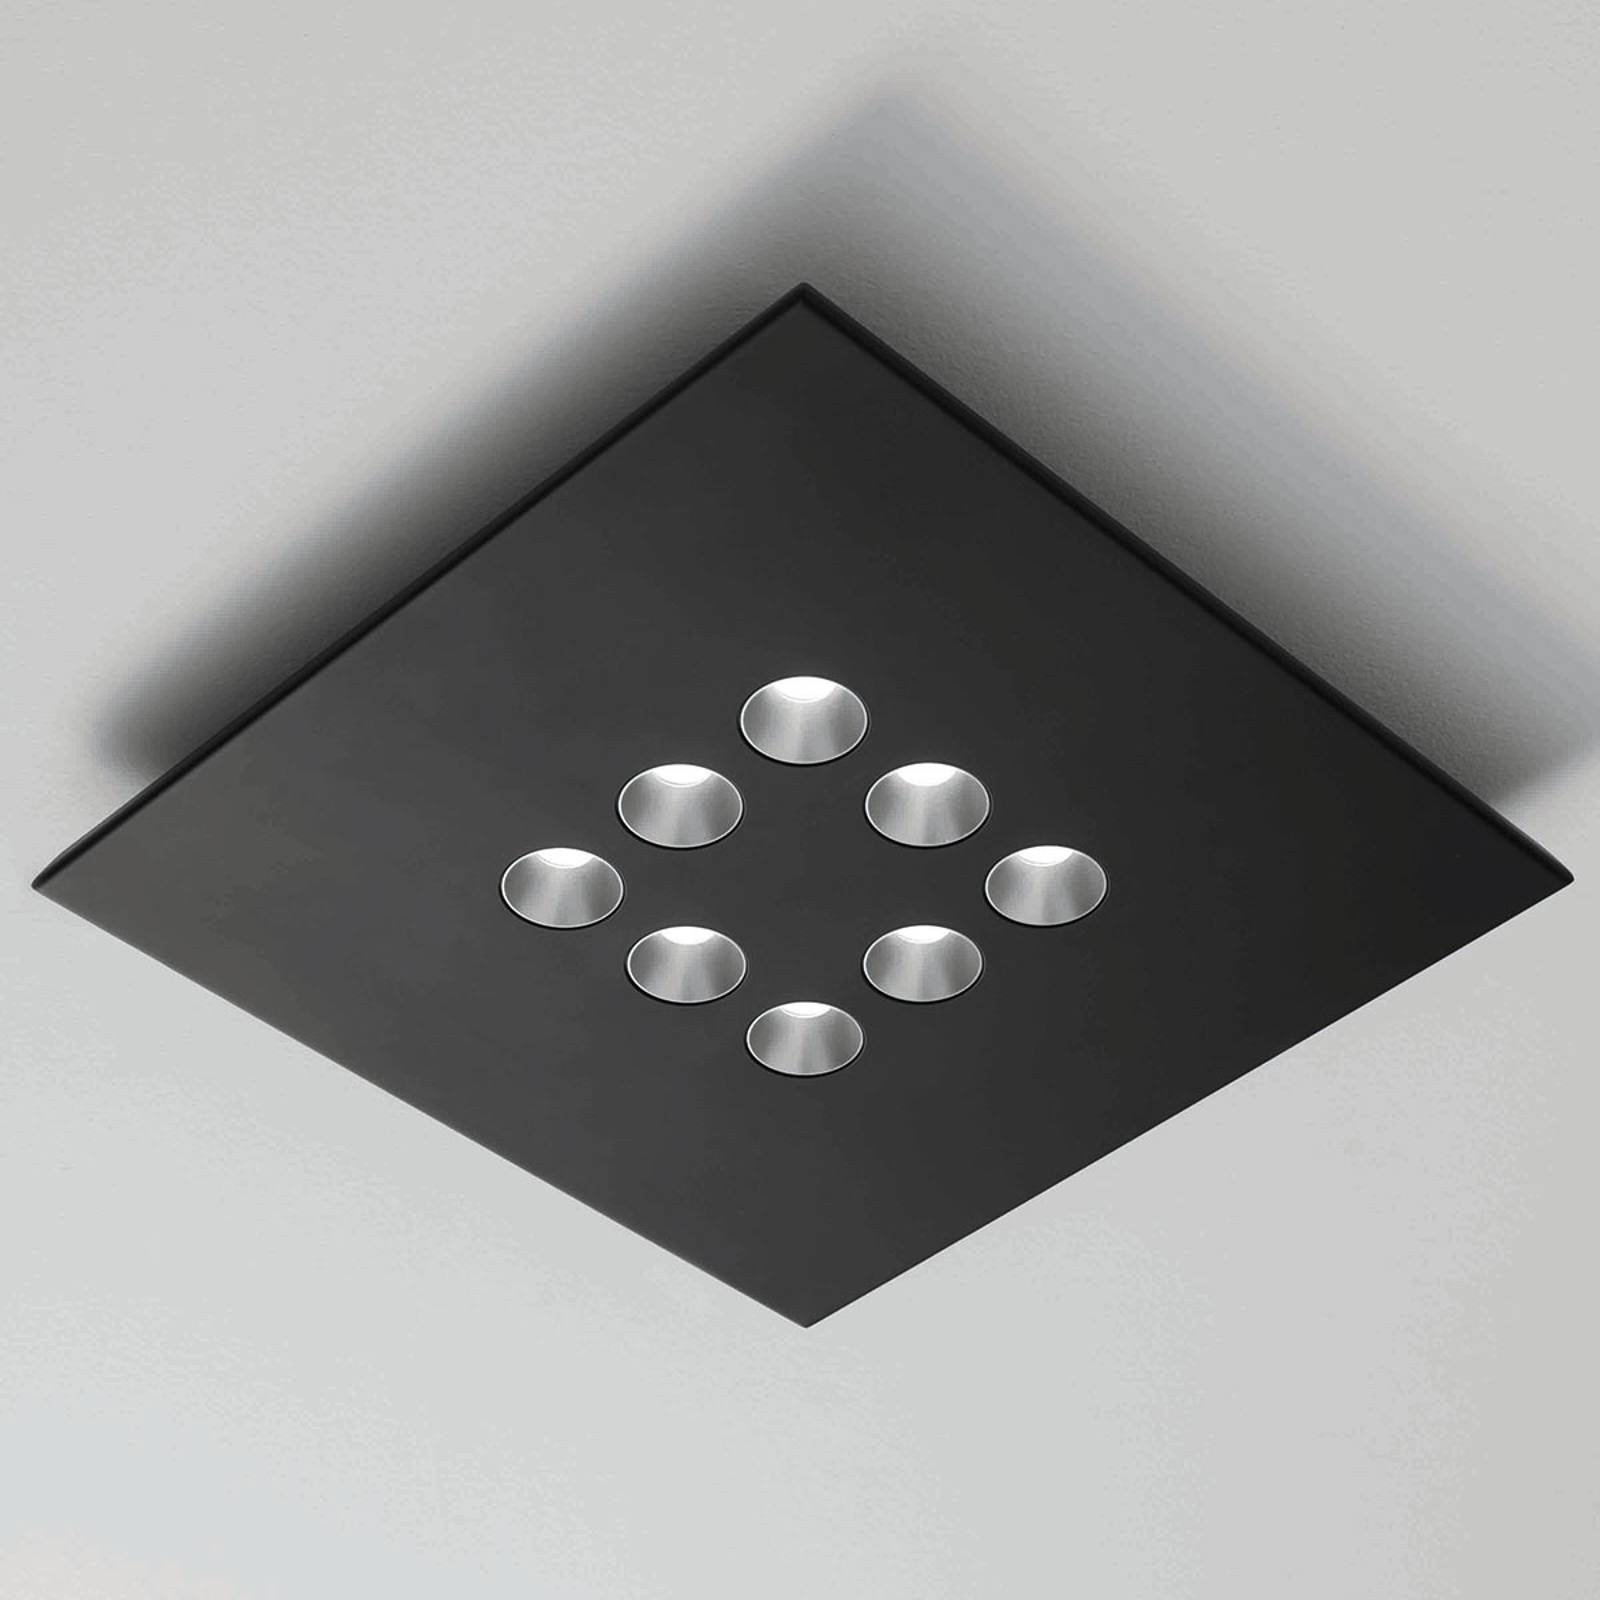 ICONE Confort LED plafondlamp in moderne optiek